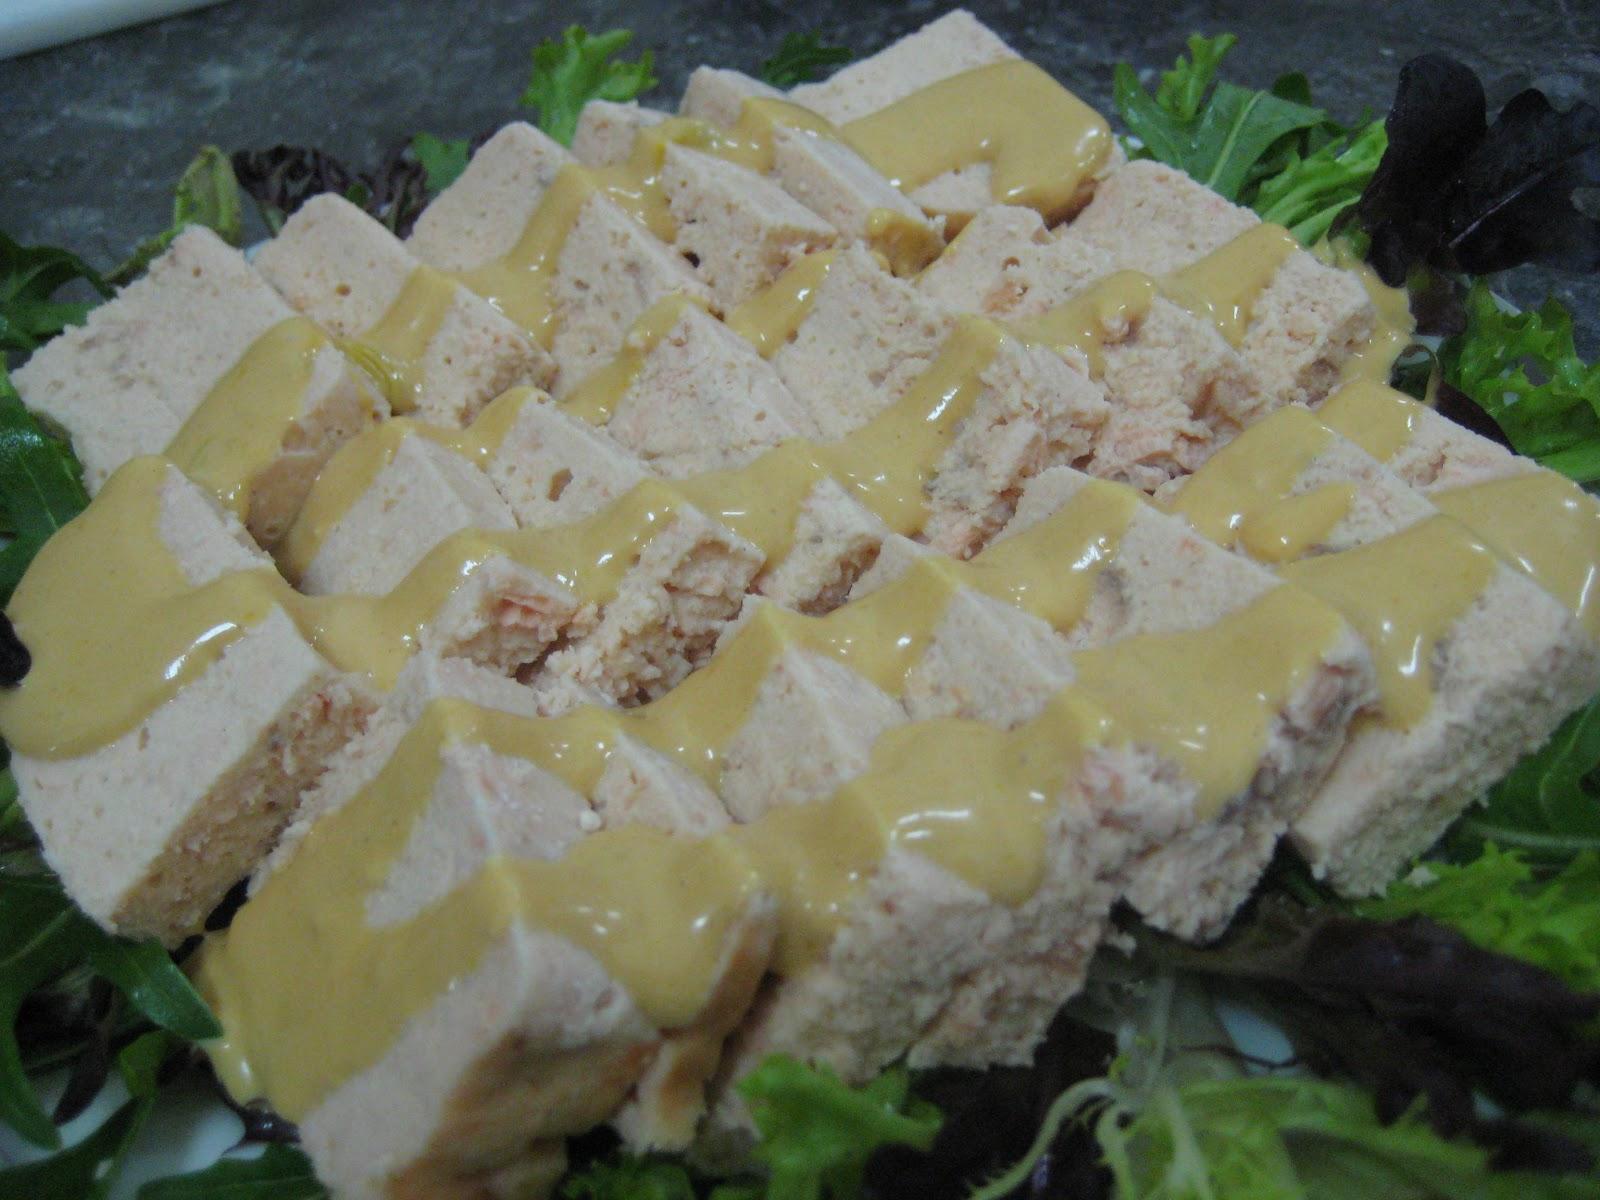 ShuMama-舒媽媽美食: 涼拌海鮮蘆筍 鮭魚奶凍